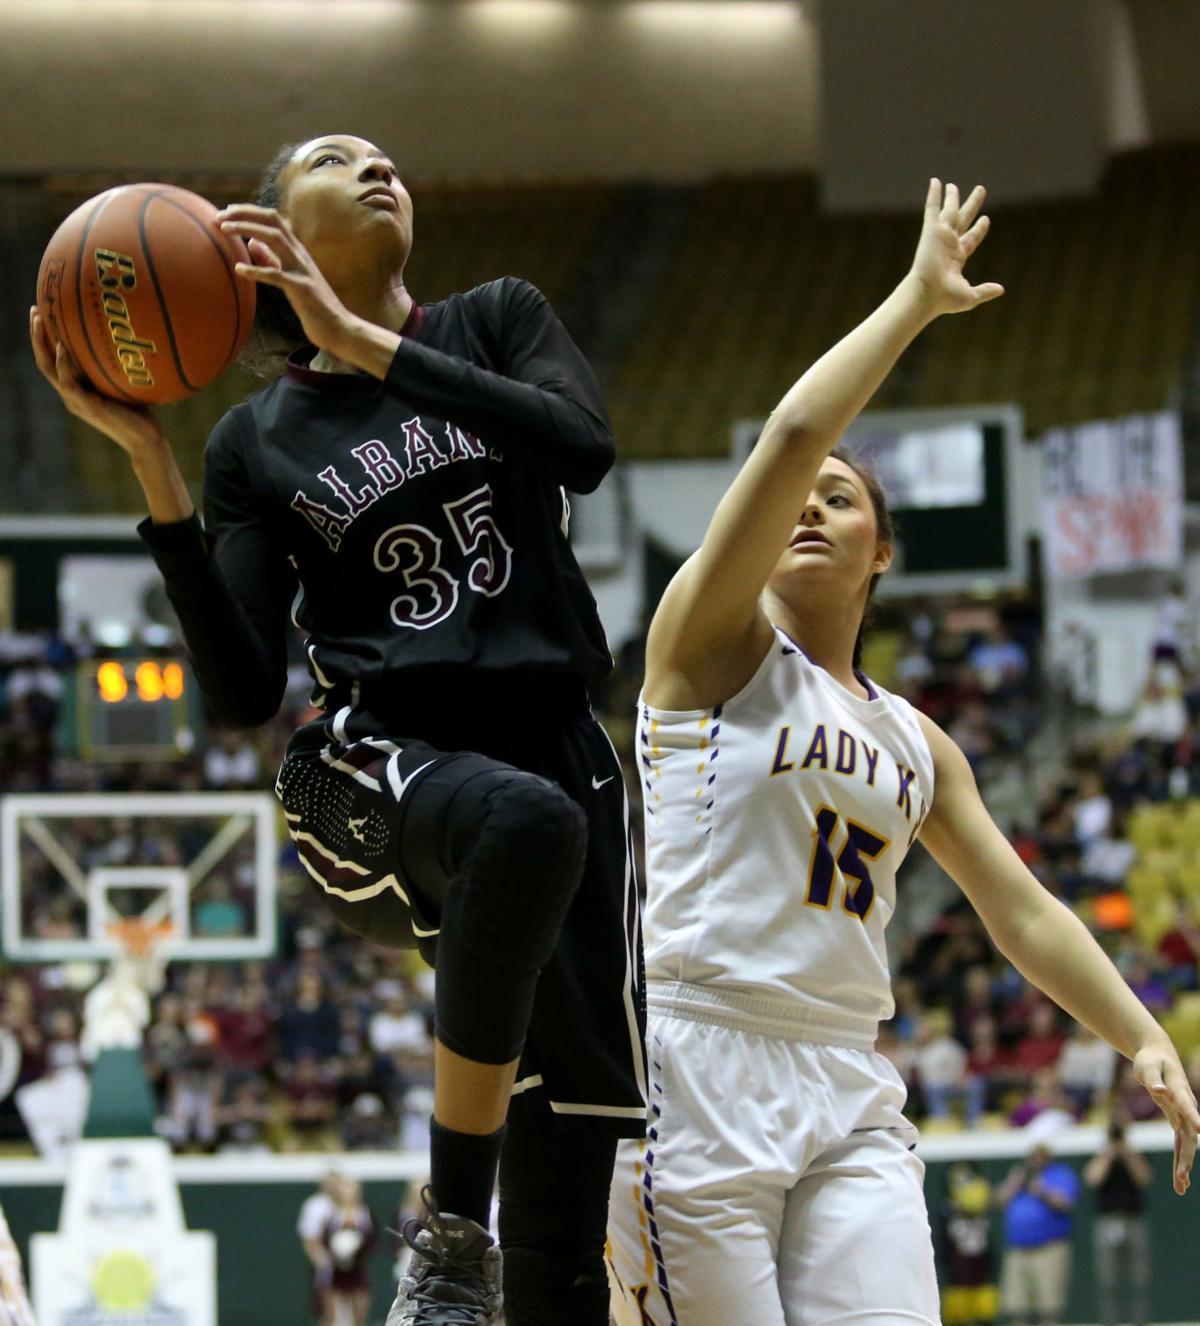 Albany basketball Natalie Kelly